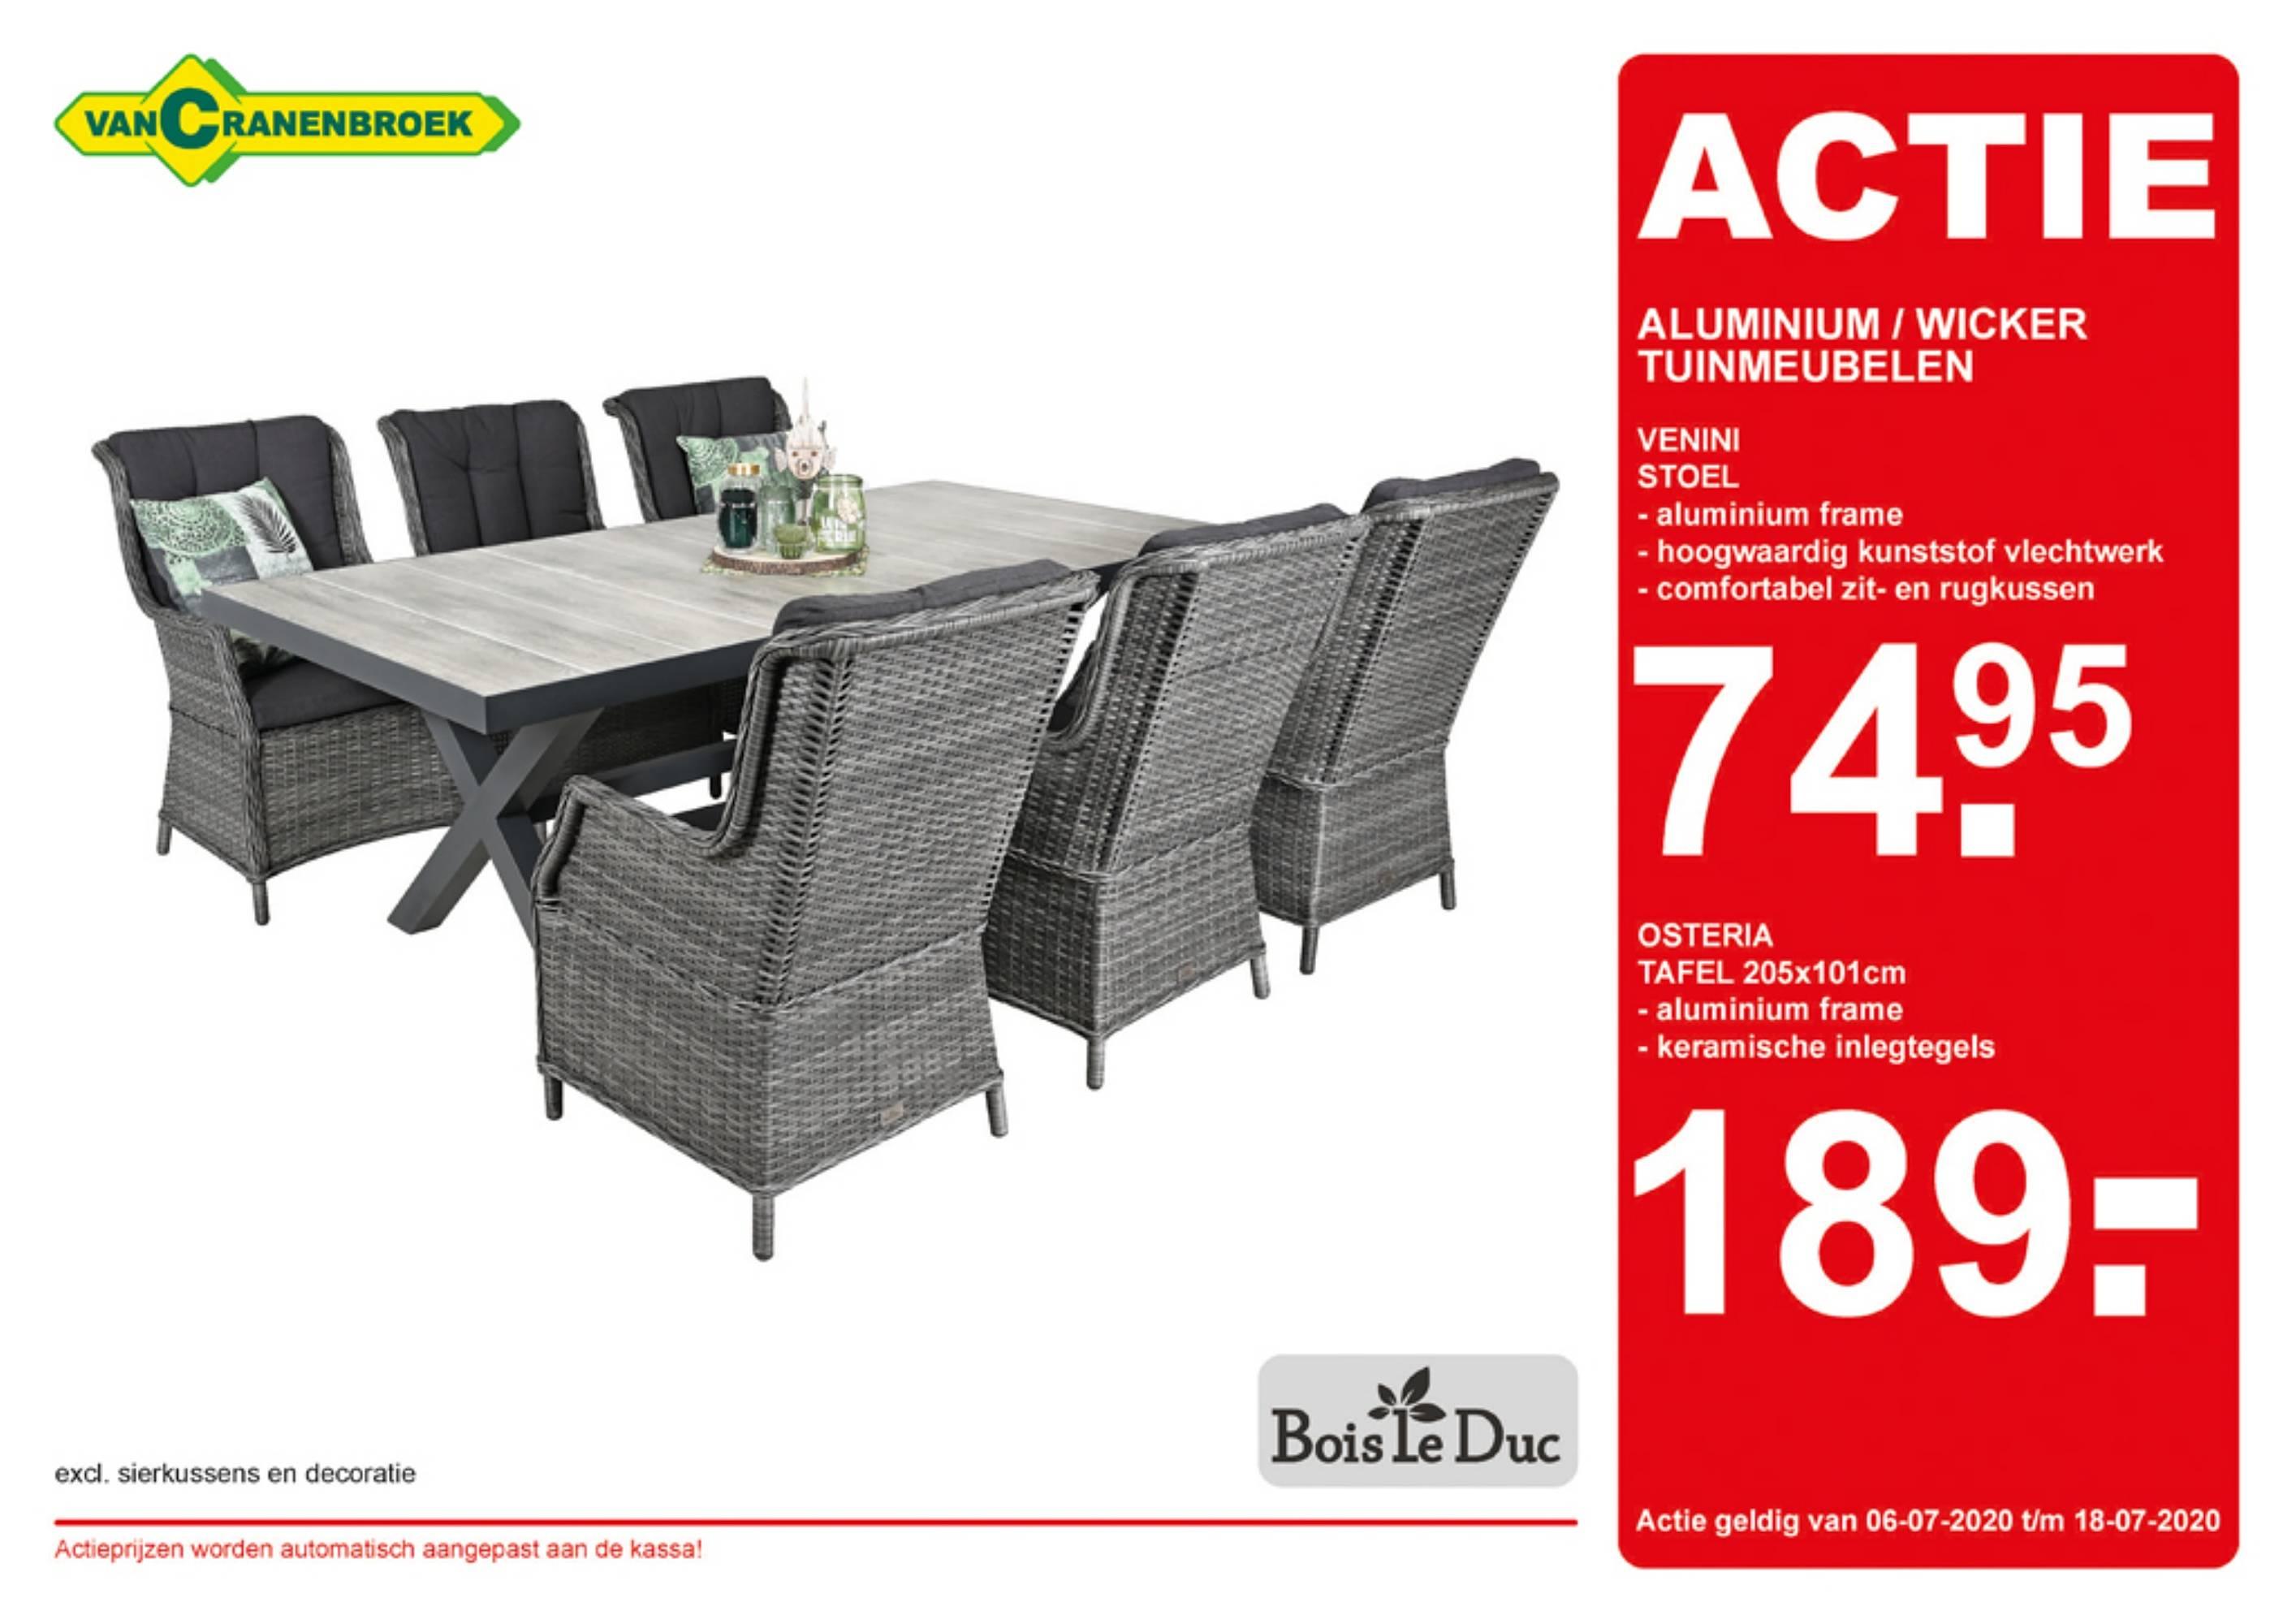 Van Cranenbroek Aluminium - Wicker Tuinmeubelen